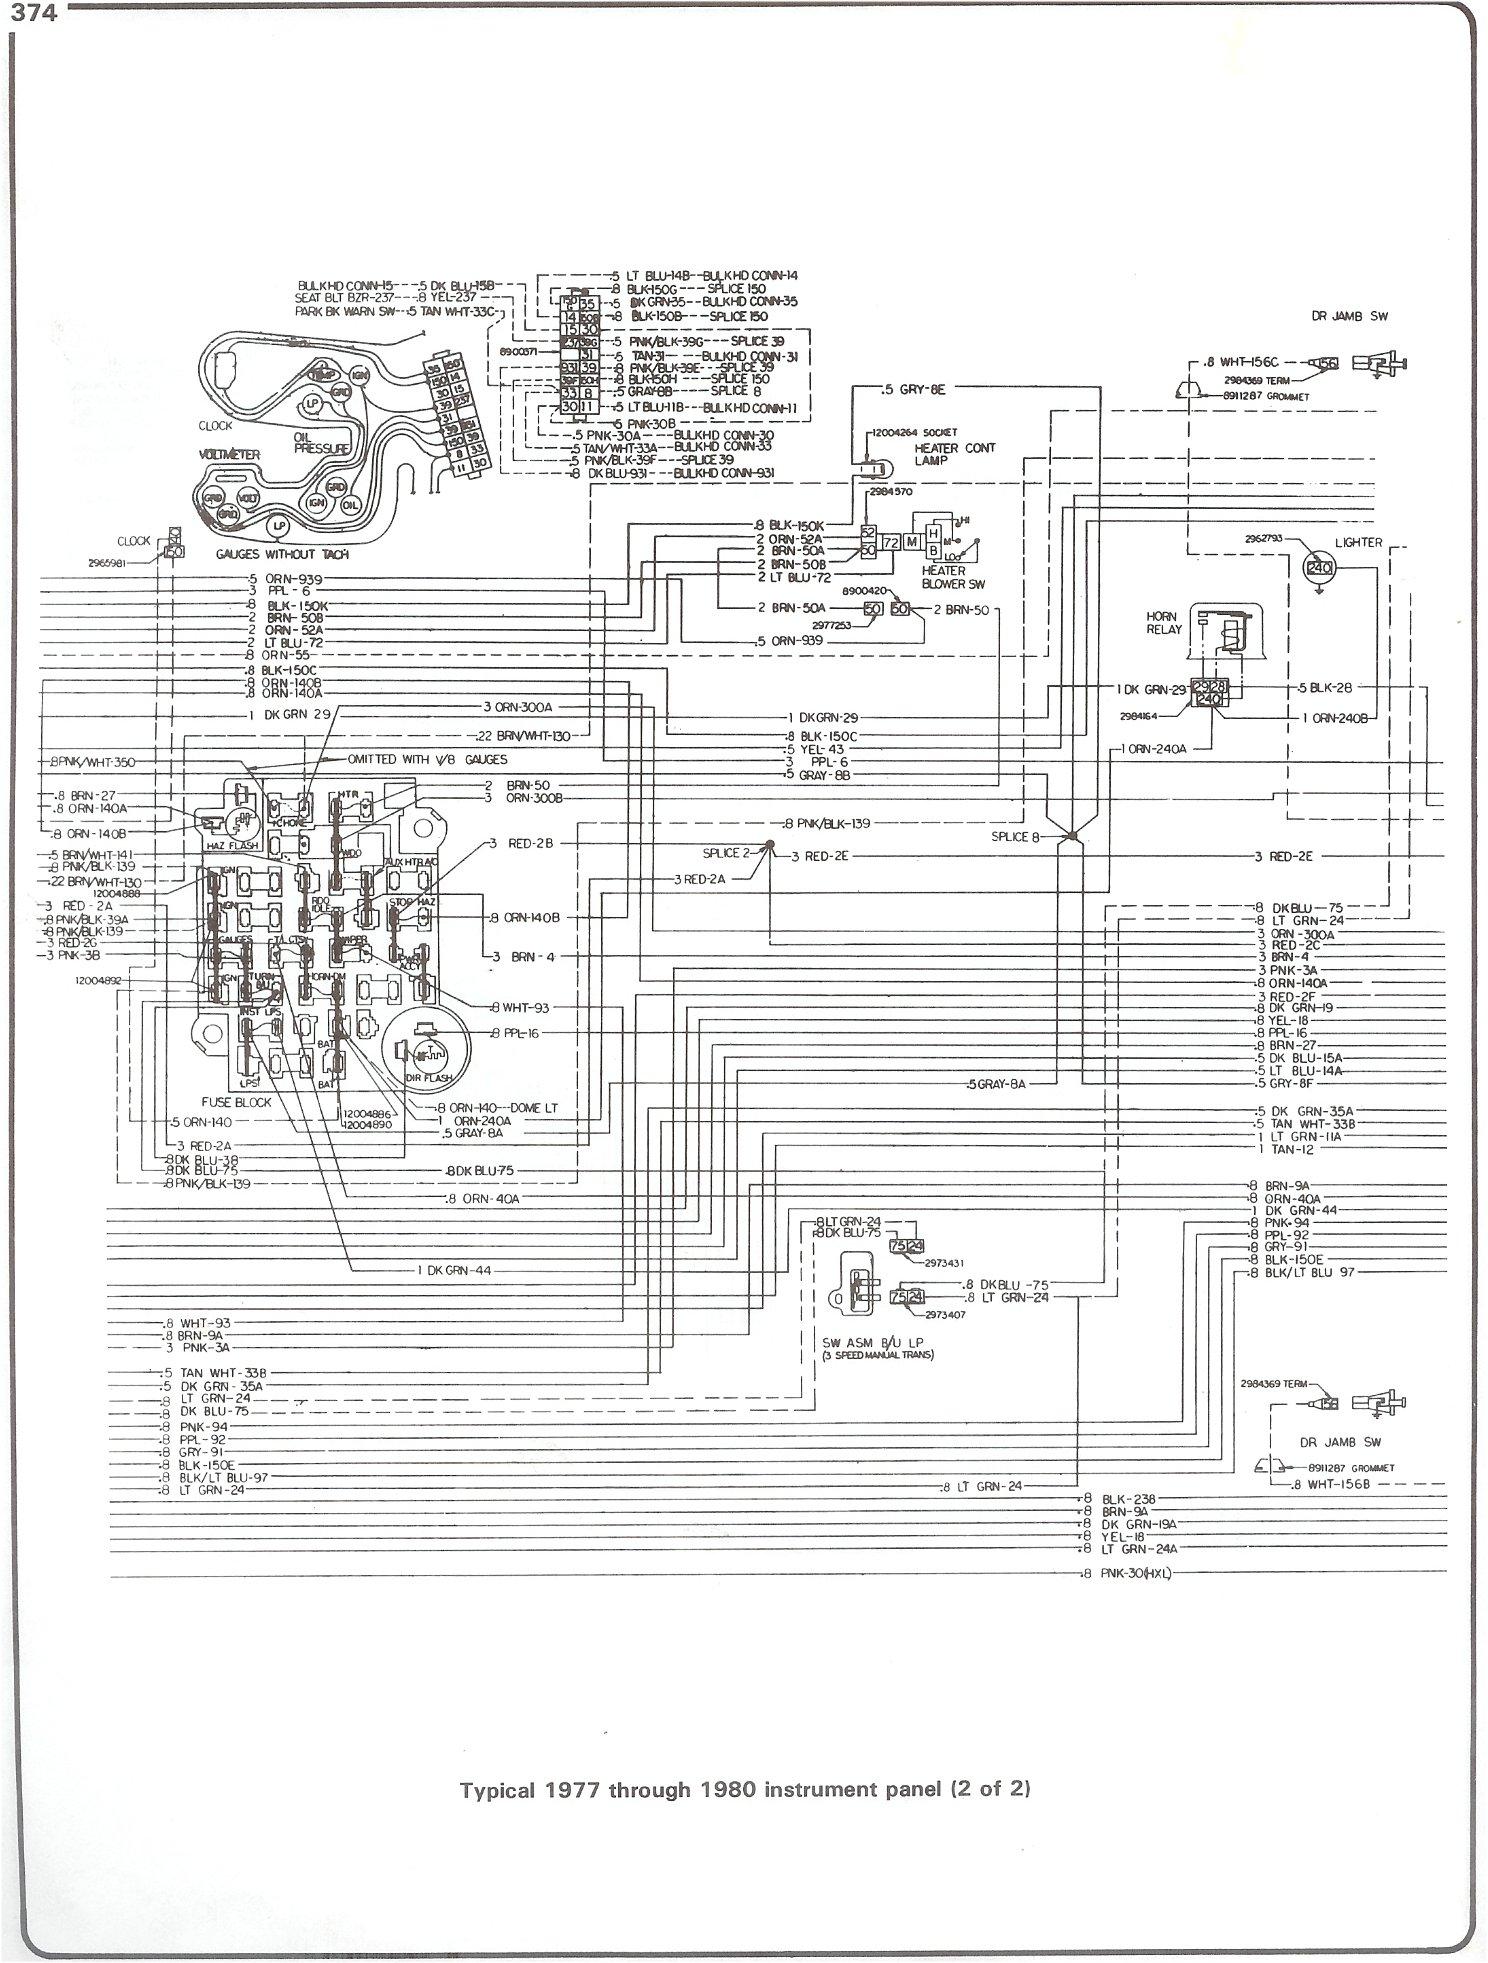 [QNCB_7524]  1982 C10 gauge replacement - help needed troubleshooting | GM Truck Club  Forum | Gm C K Series Wiring Schematic |  | GM Truck Club Forum